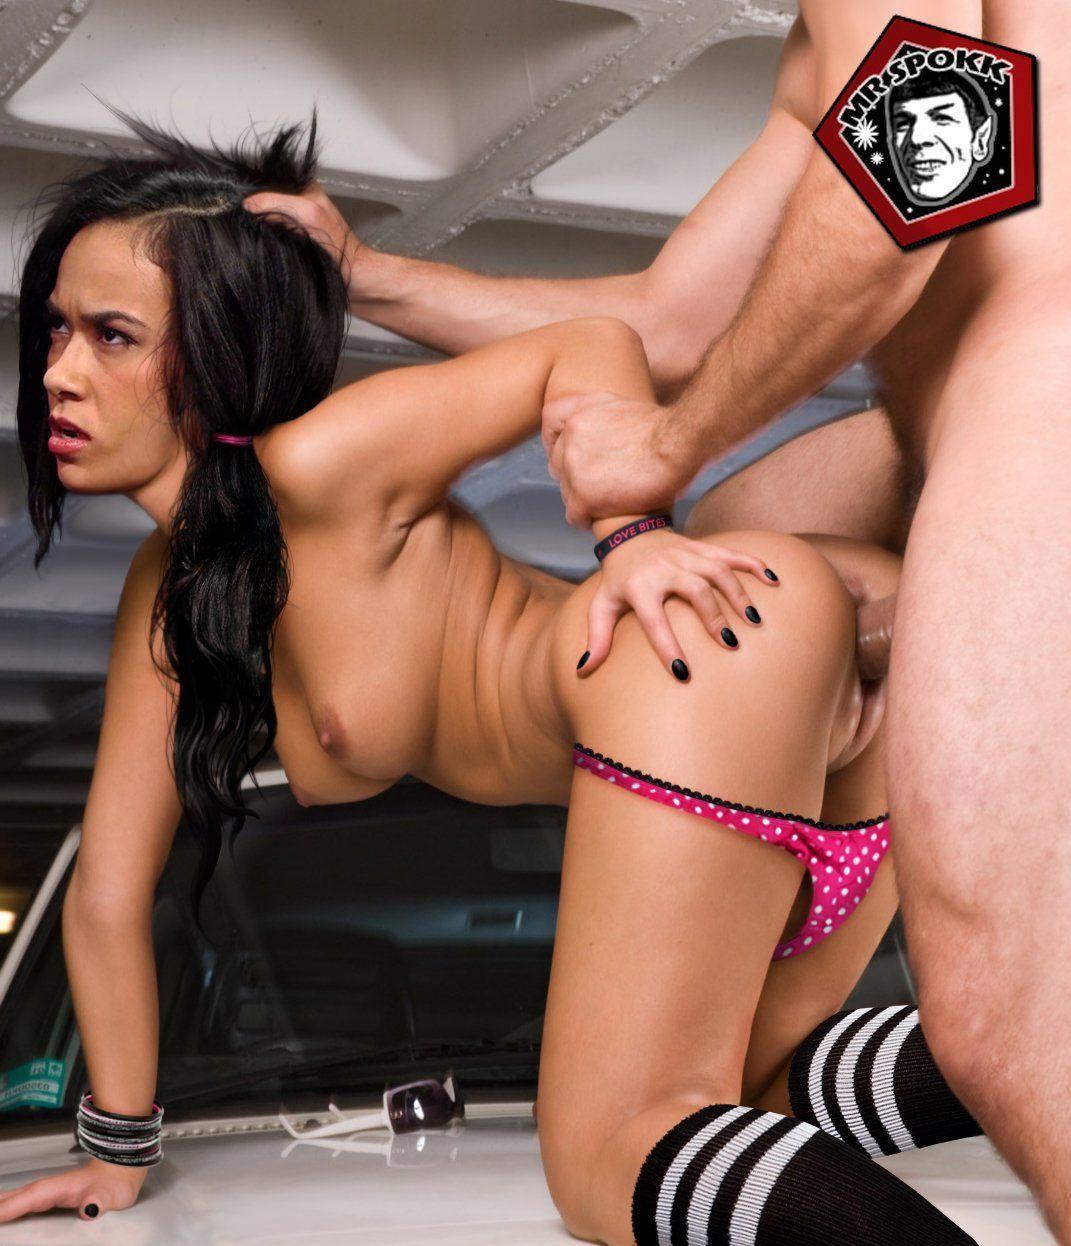 Cumming in girls pussies